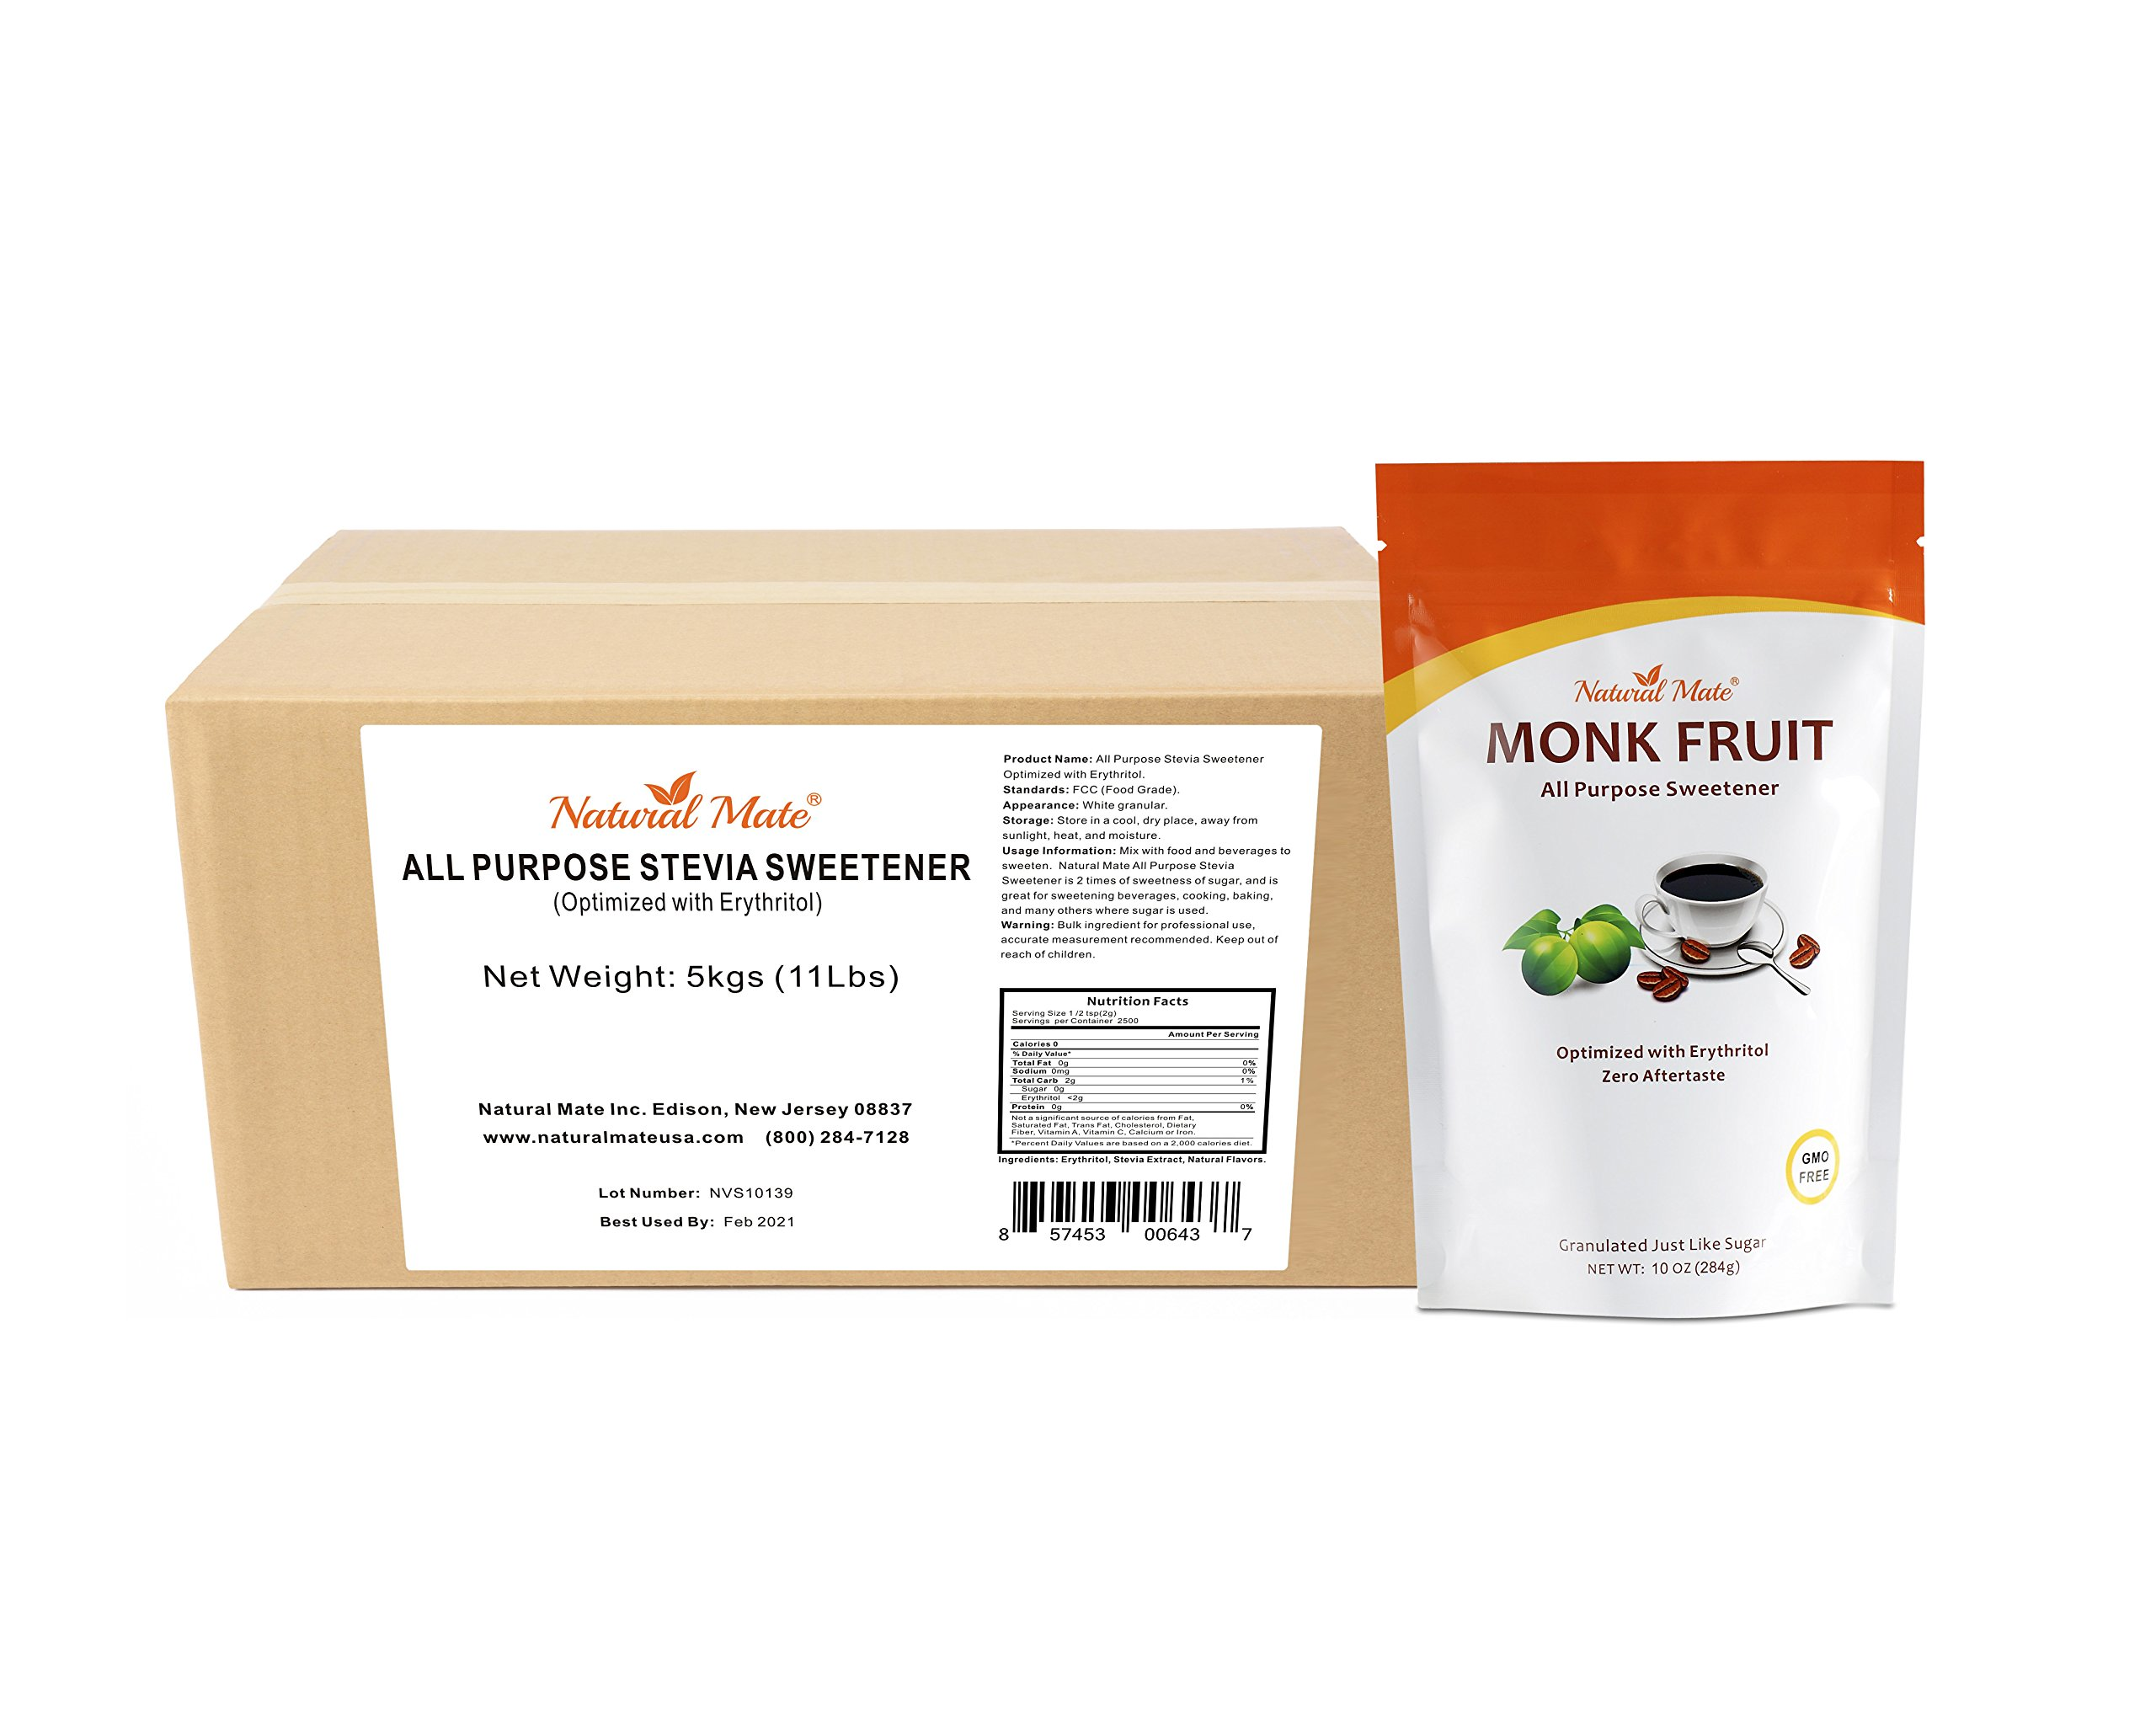 Natural Mate Stevia All Purpose Natural Sweetener, 5kgs/11Lbs | Free Gift: Monk Fruit Sweetener (10oz) by Natural Mate